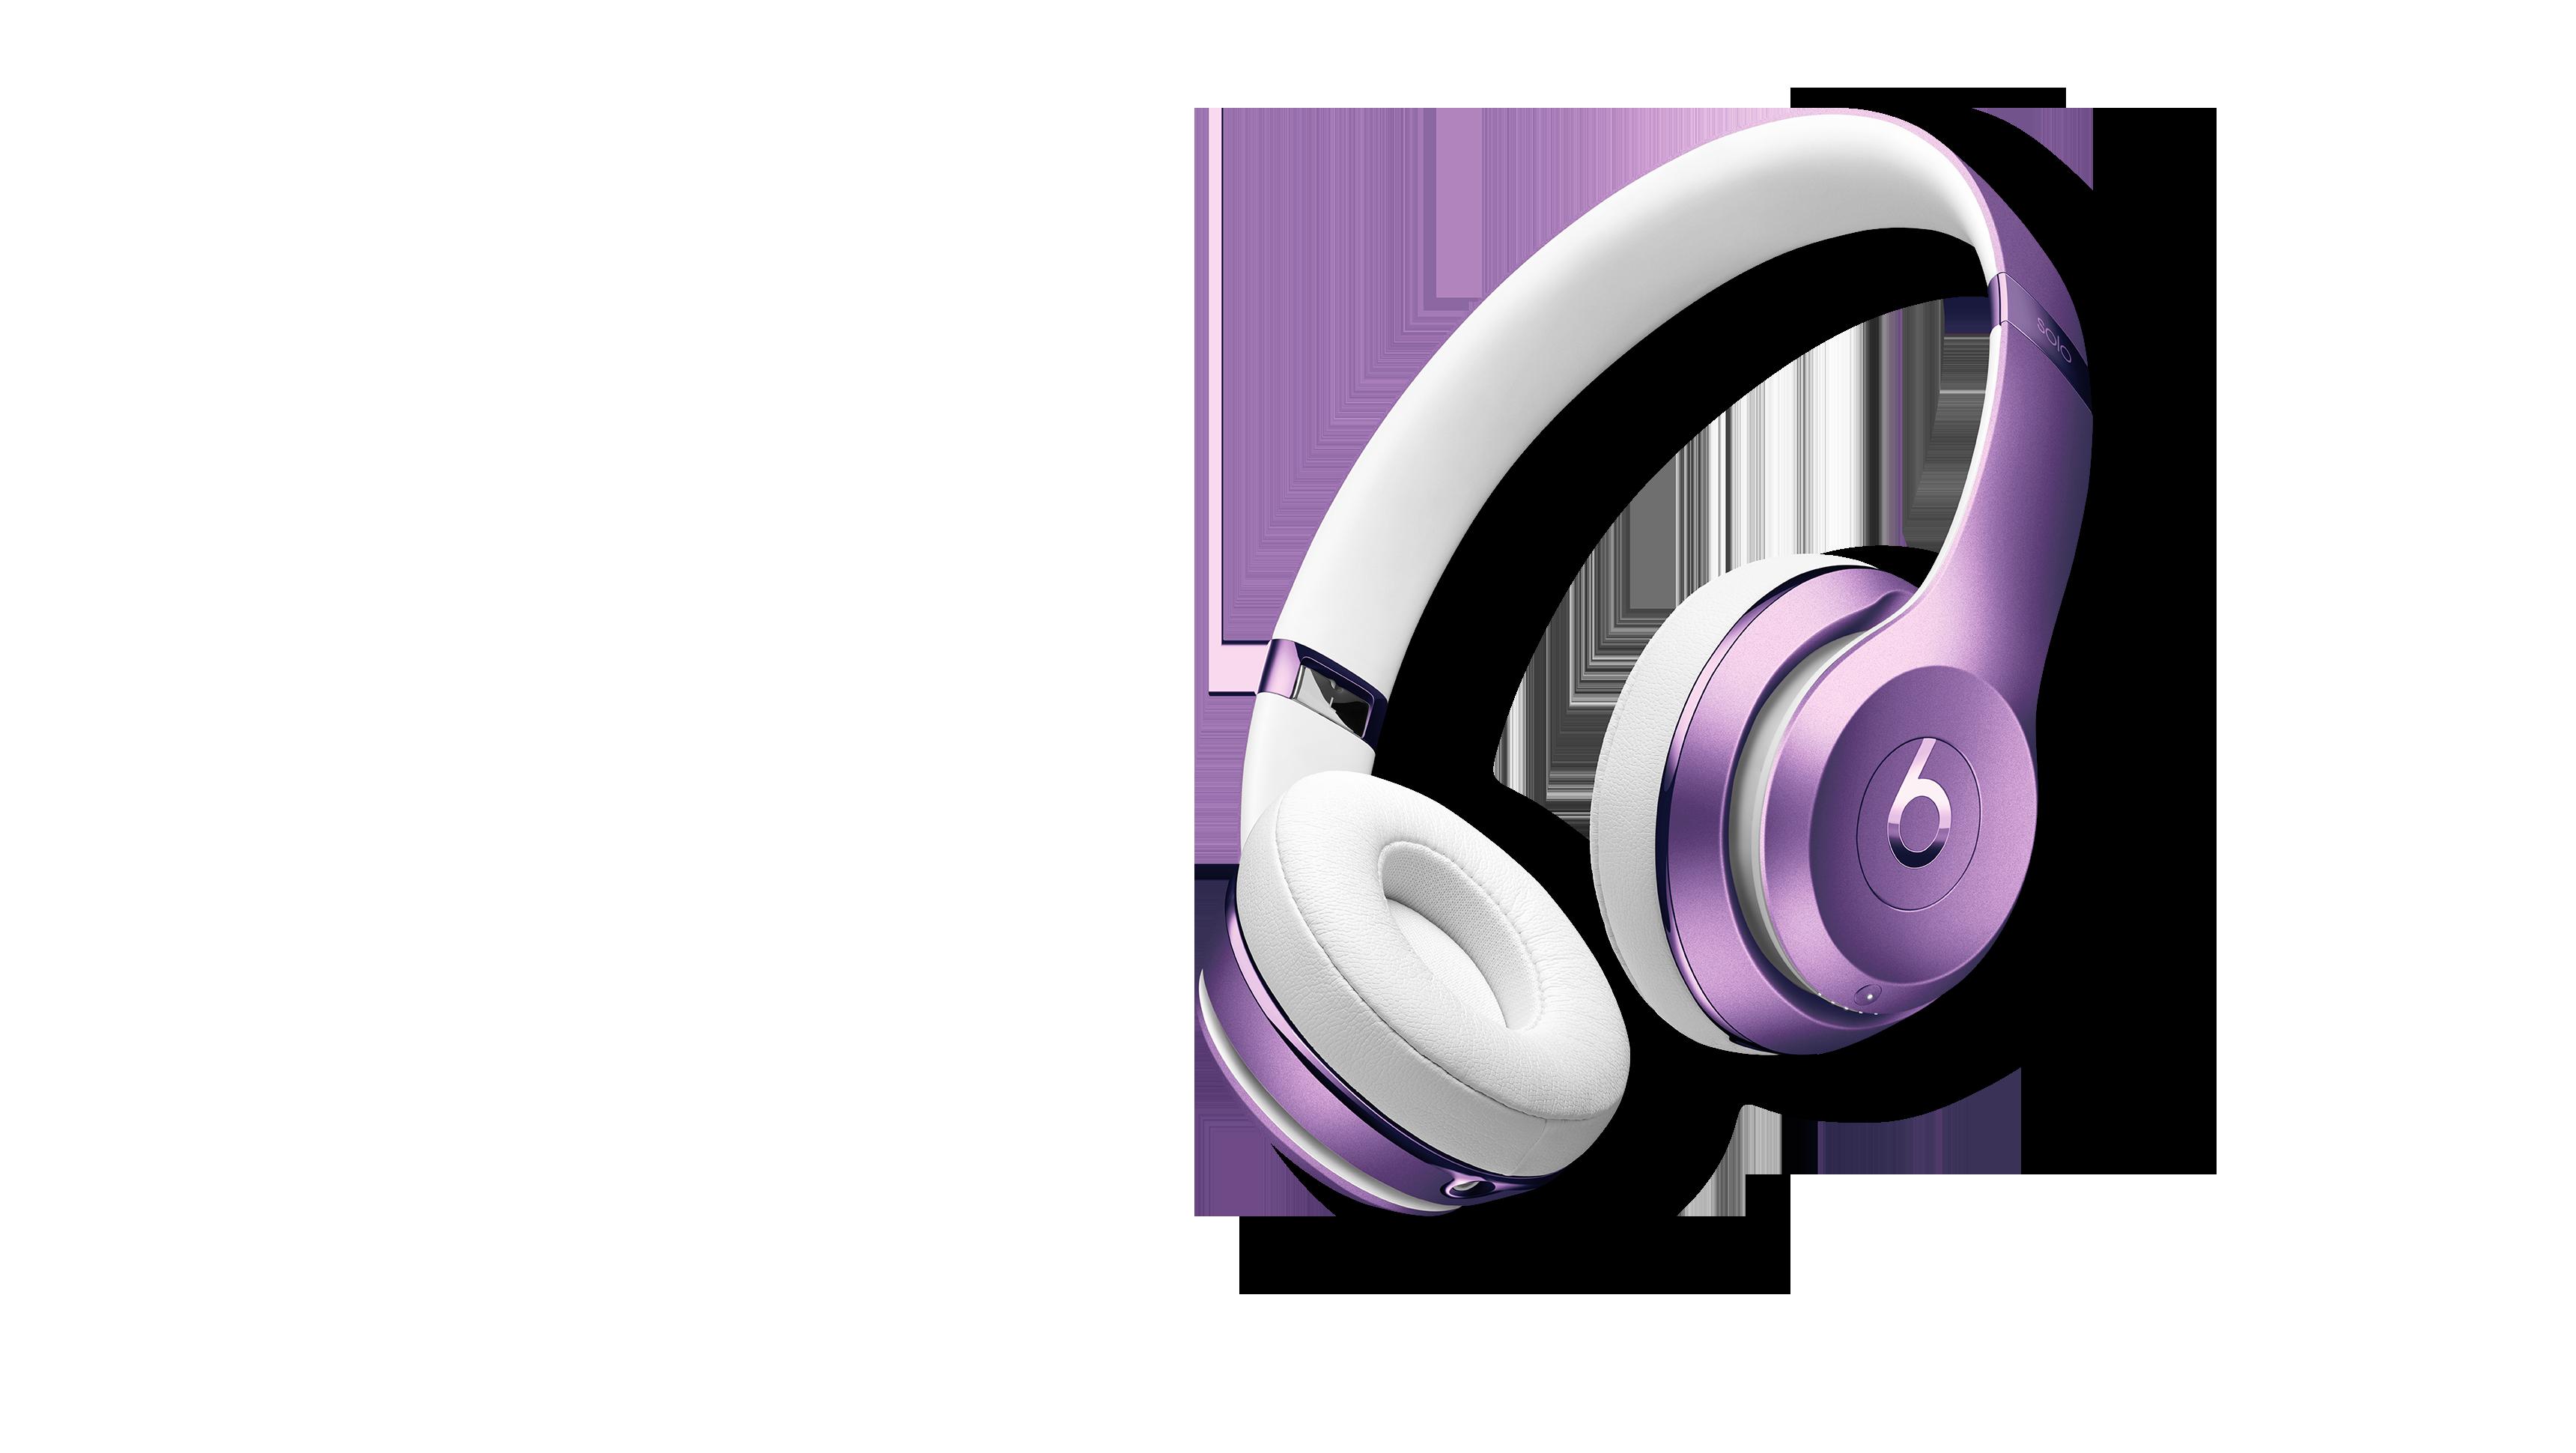 Beats wireless headphones ultra violet - wireless headphone adapter for beats